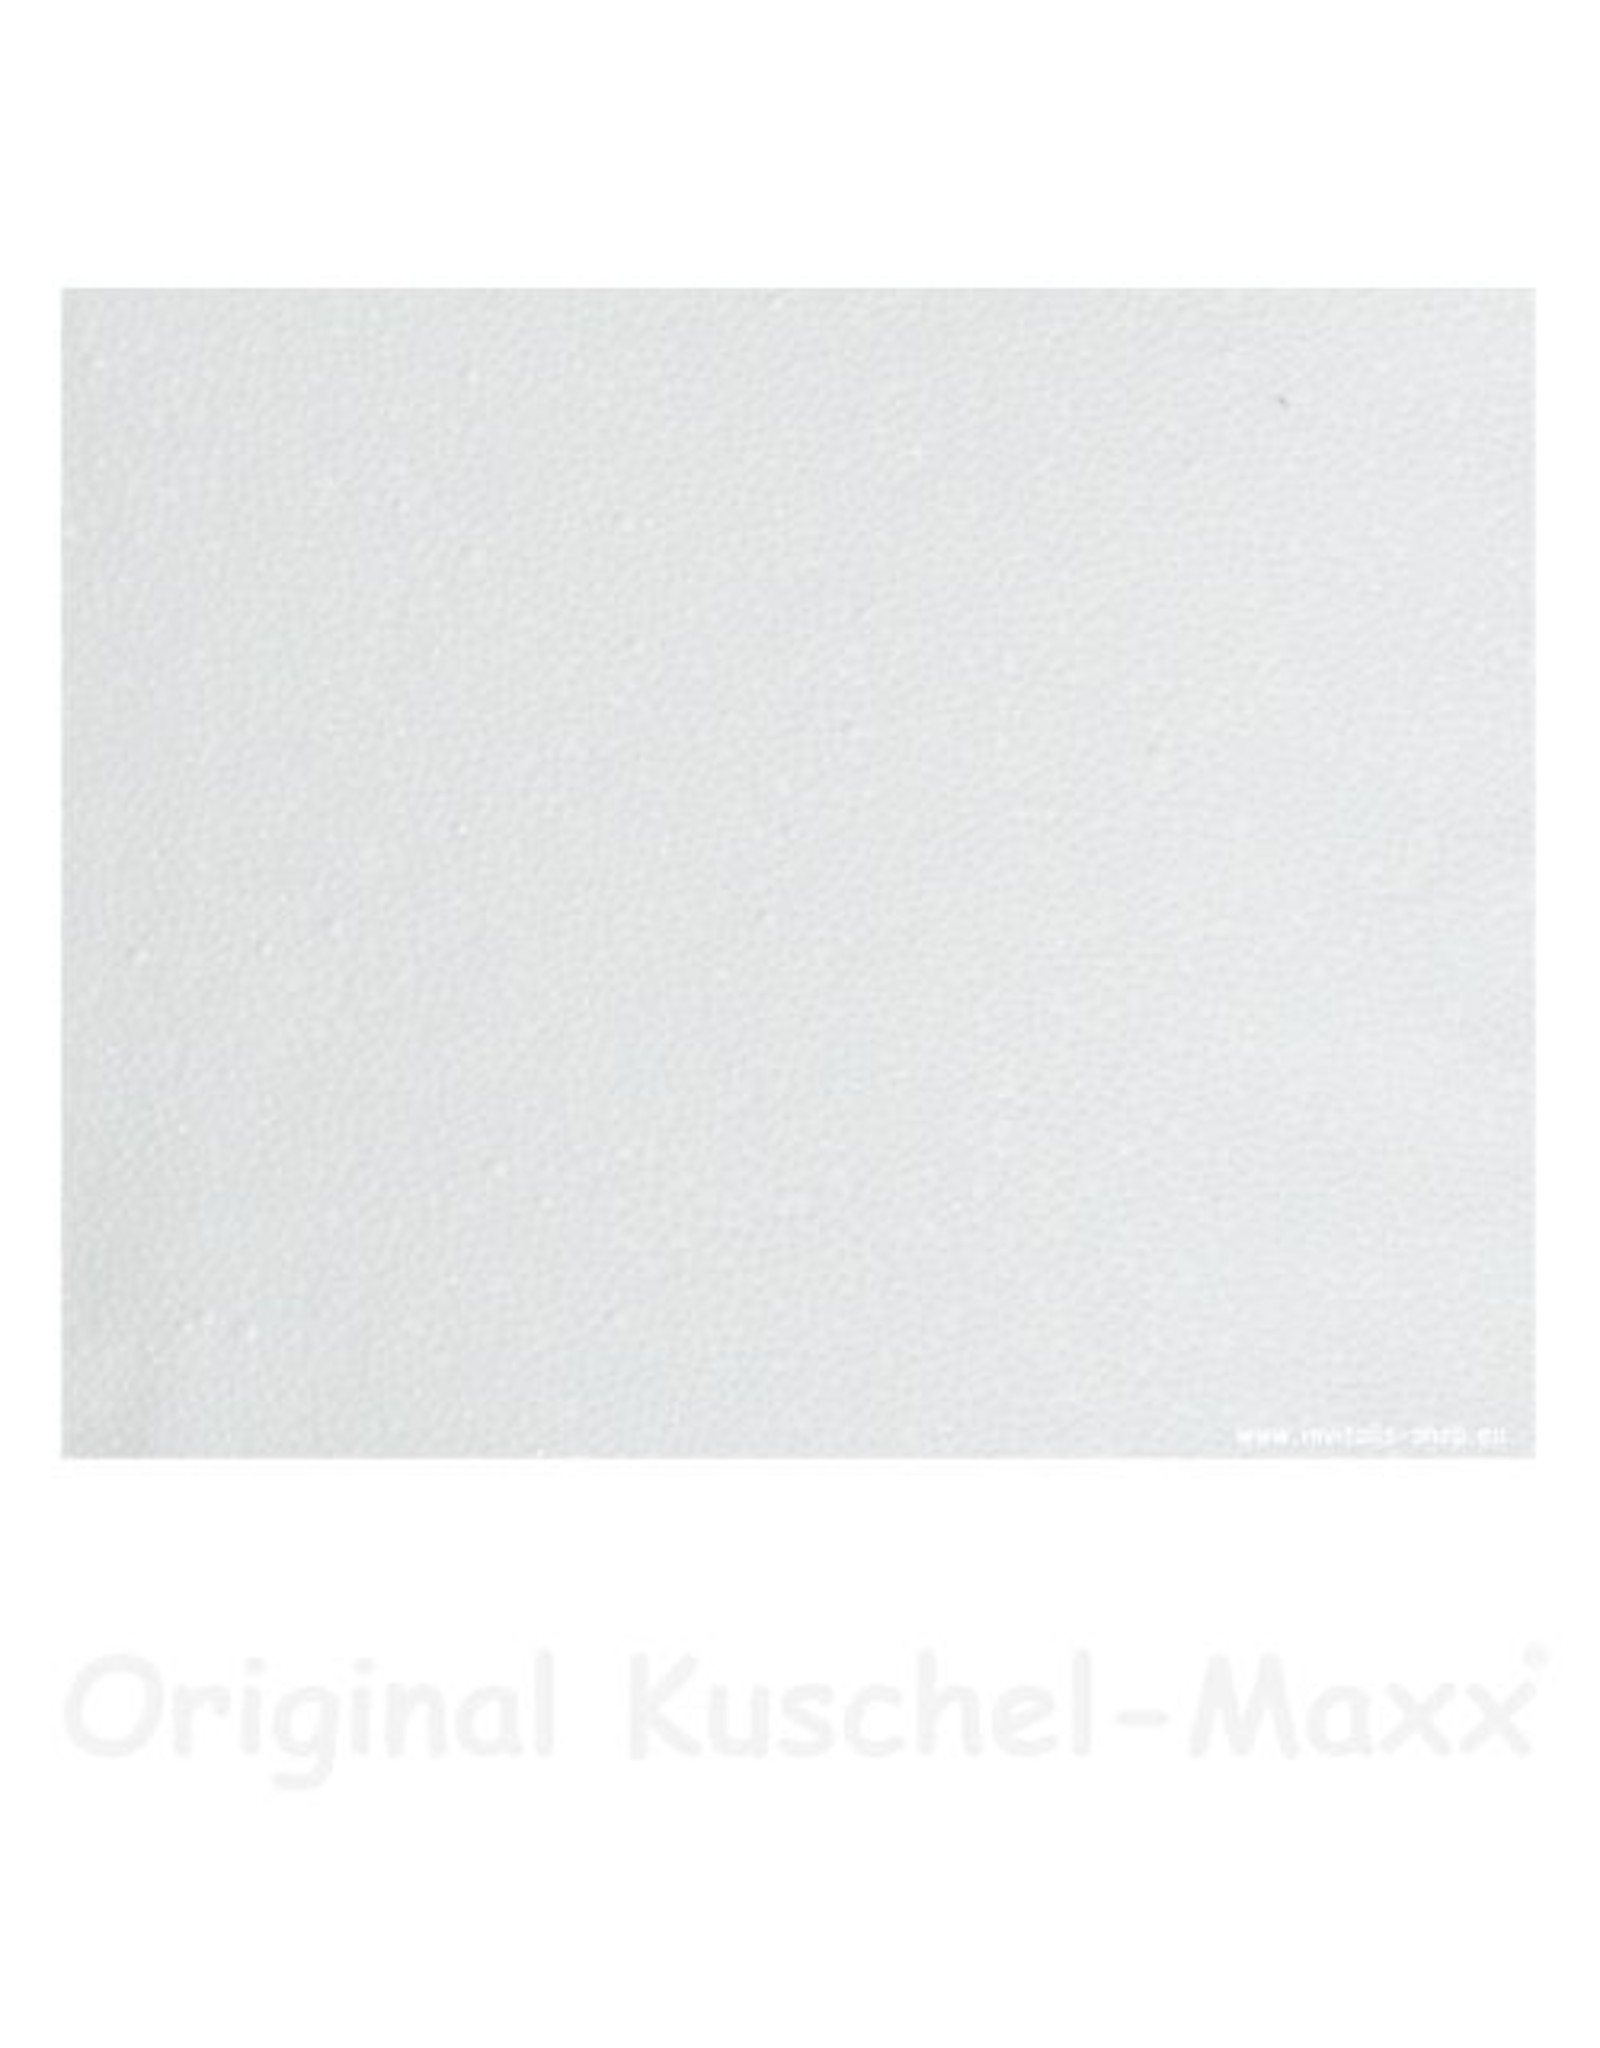 Kuschel-Maxx Kuschel-Maxx Nachfüllset